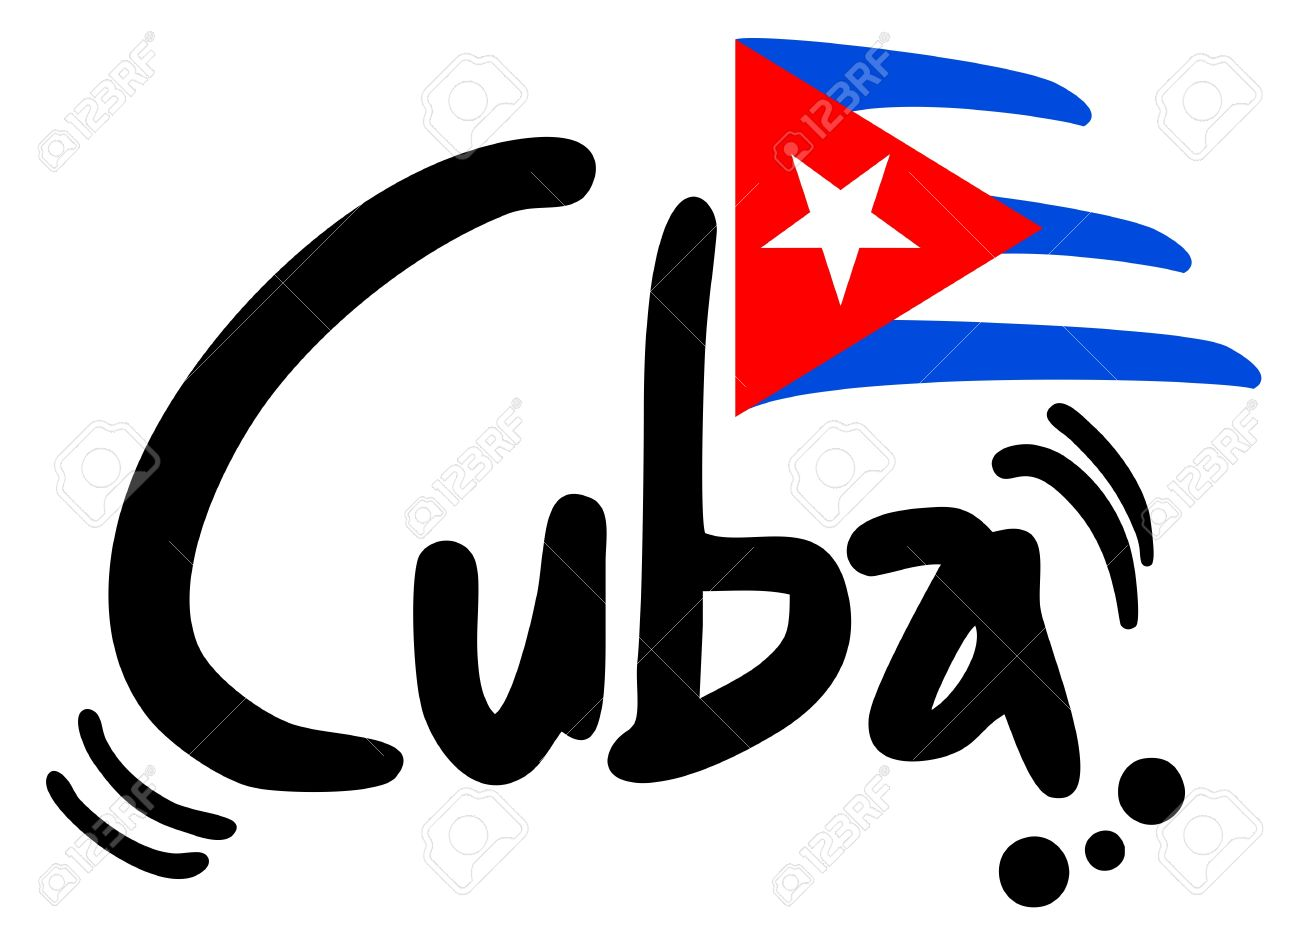 Cuba clipart #15, Download drawings